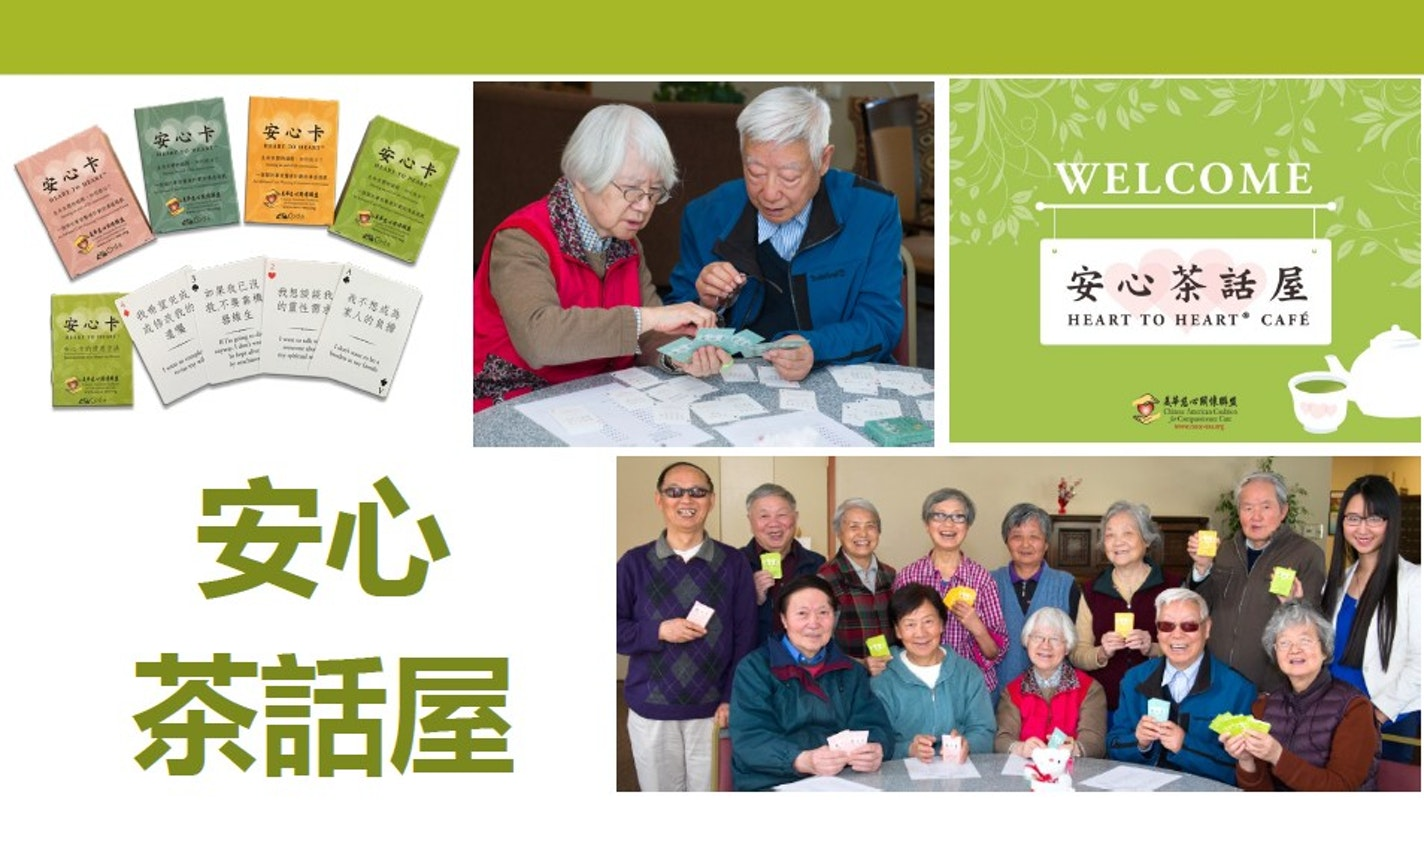 Heart to Heart® Café 線上安心茶話屋 (Online)